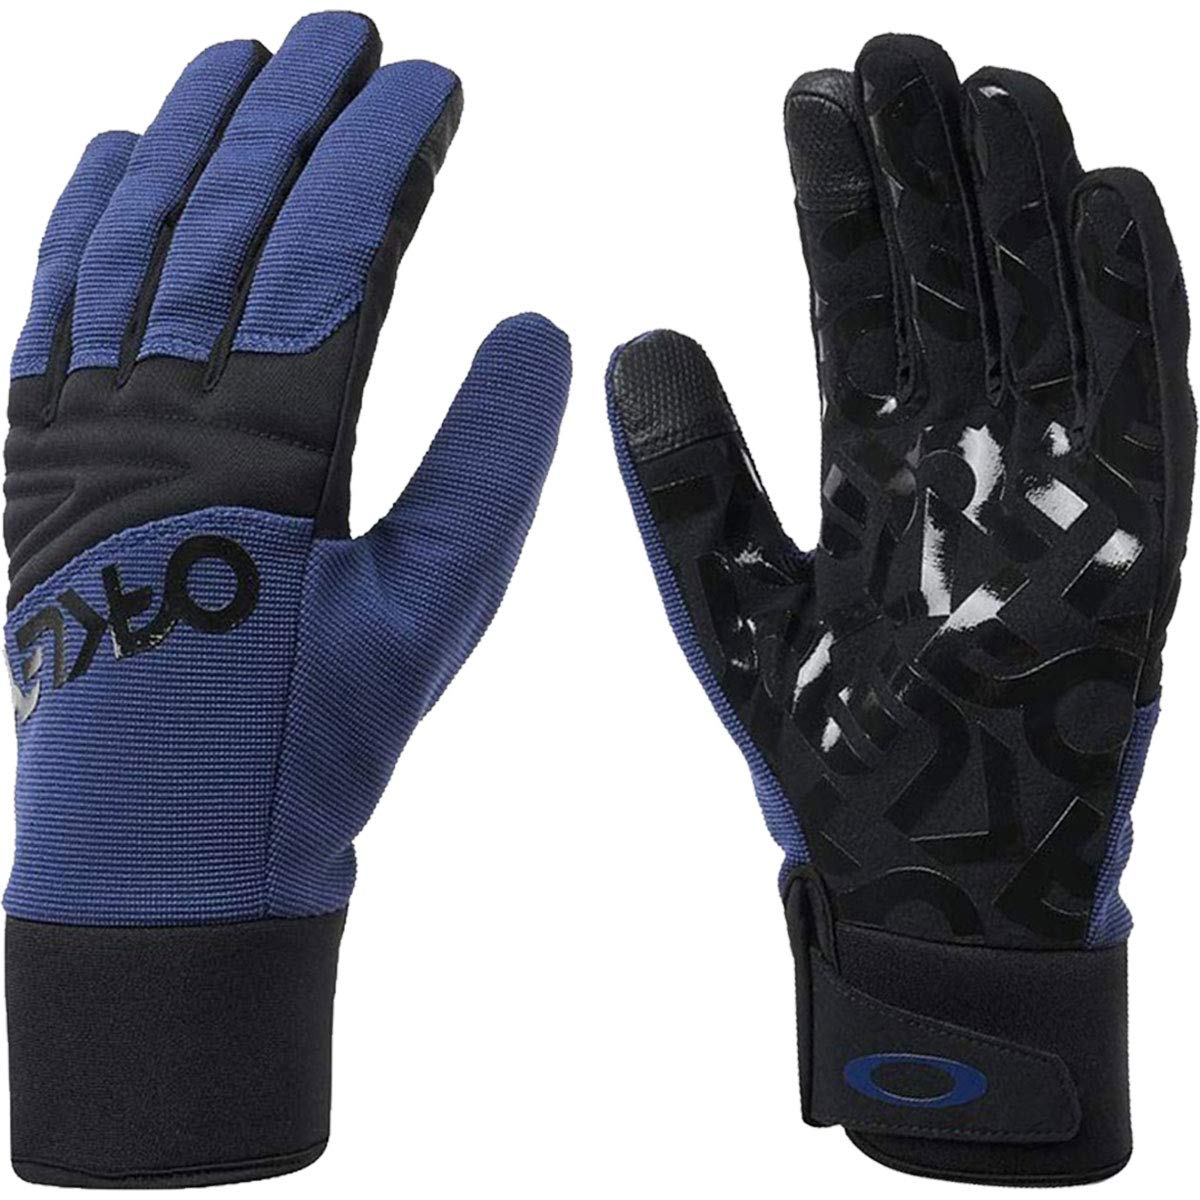 Oakley Factory Park Men's Snowmobile Gloves - Dark Blue/Small